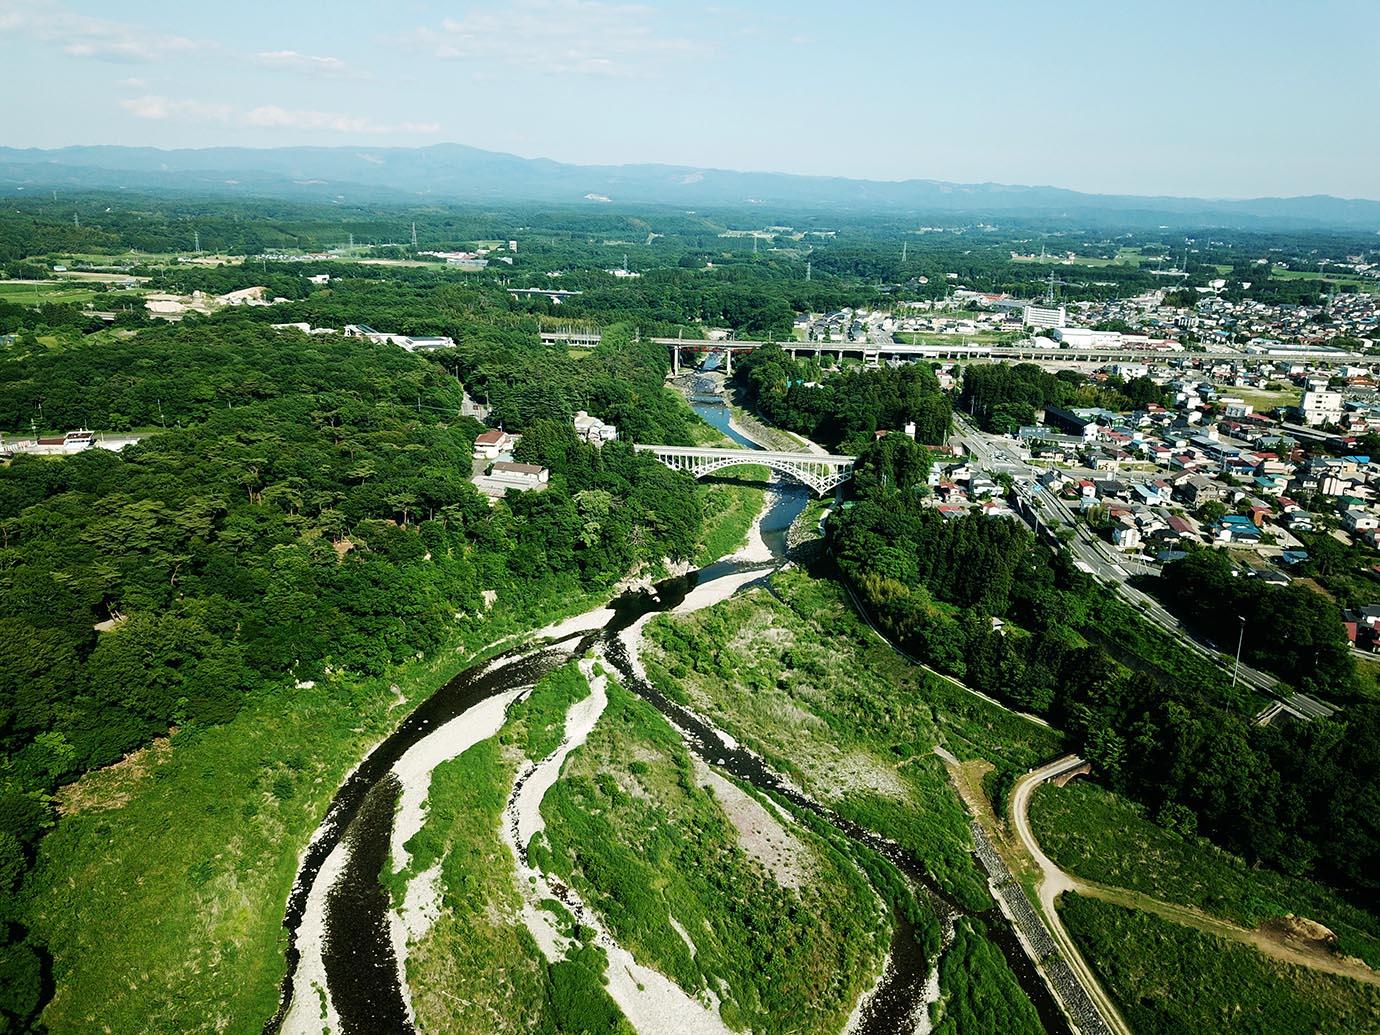 drone-superb-view-kuroiso-nakagawa6